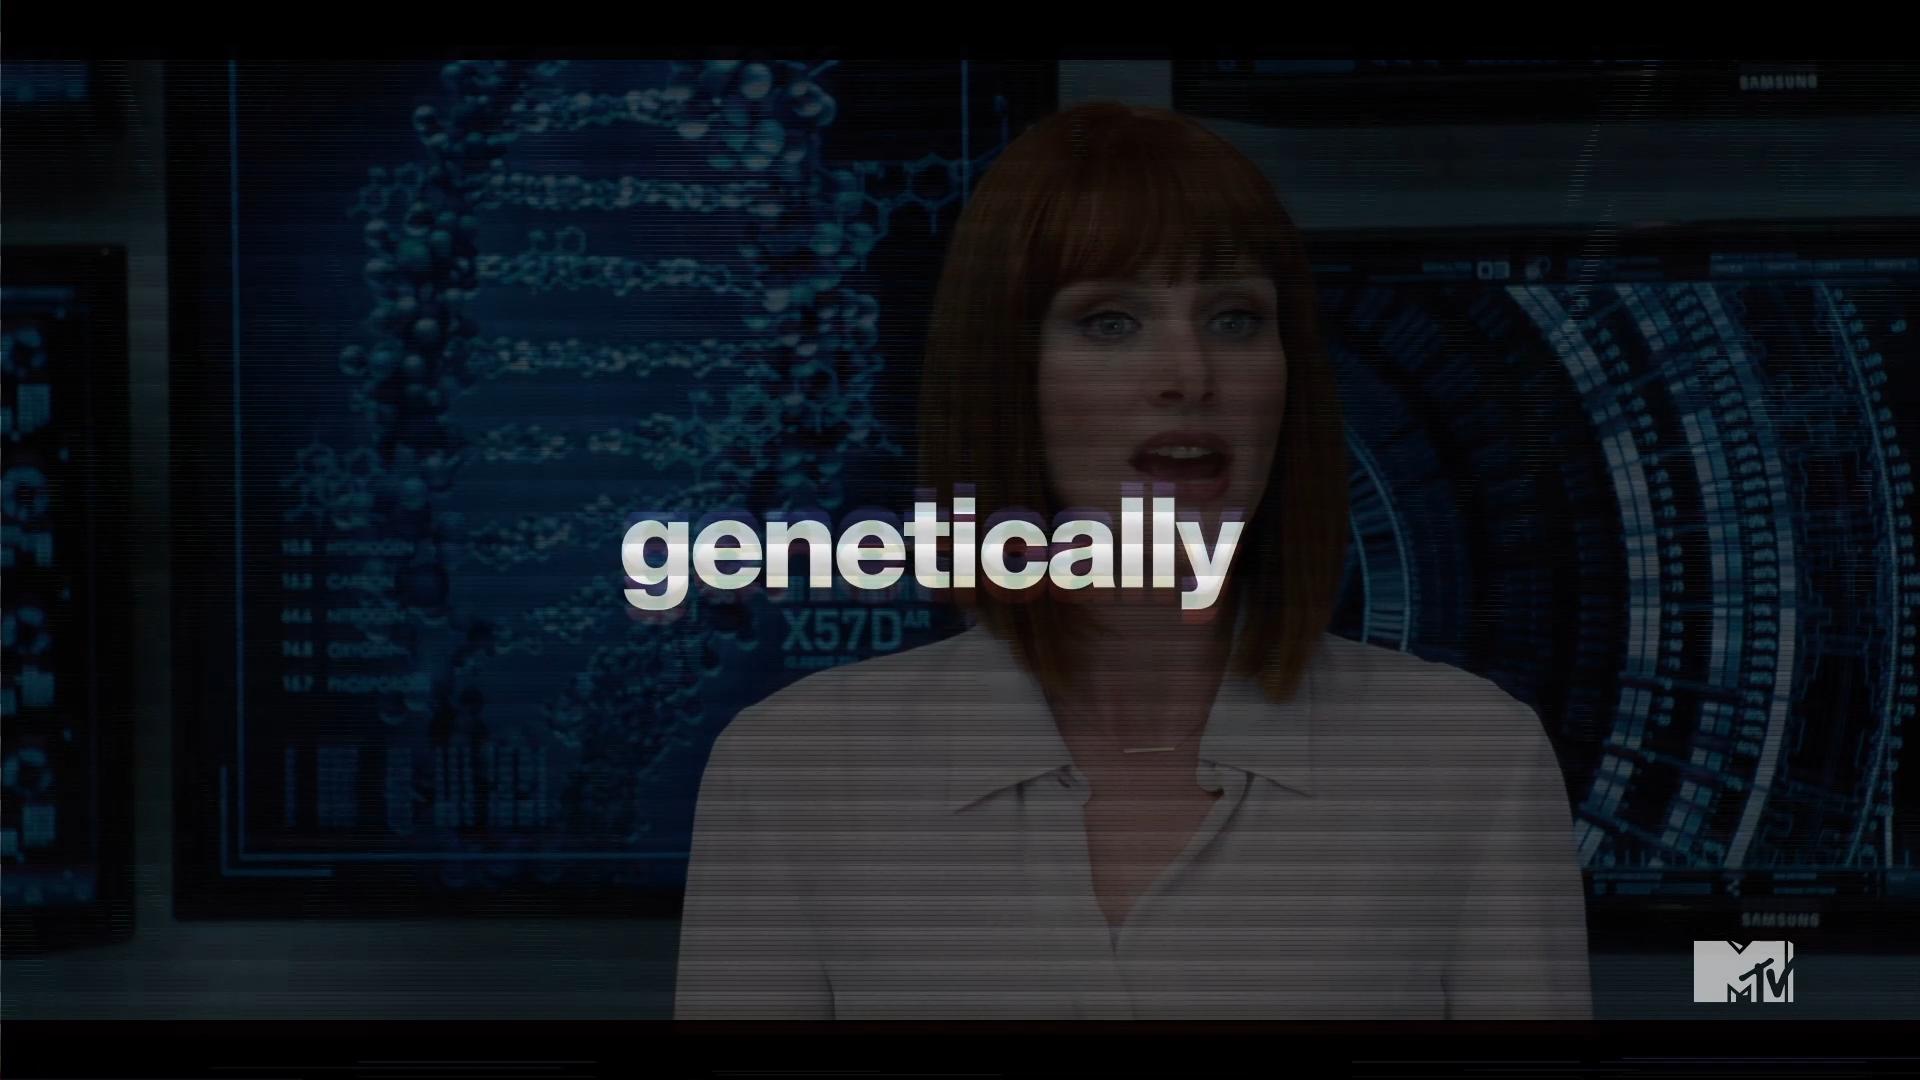 Genetic_02.png